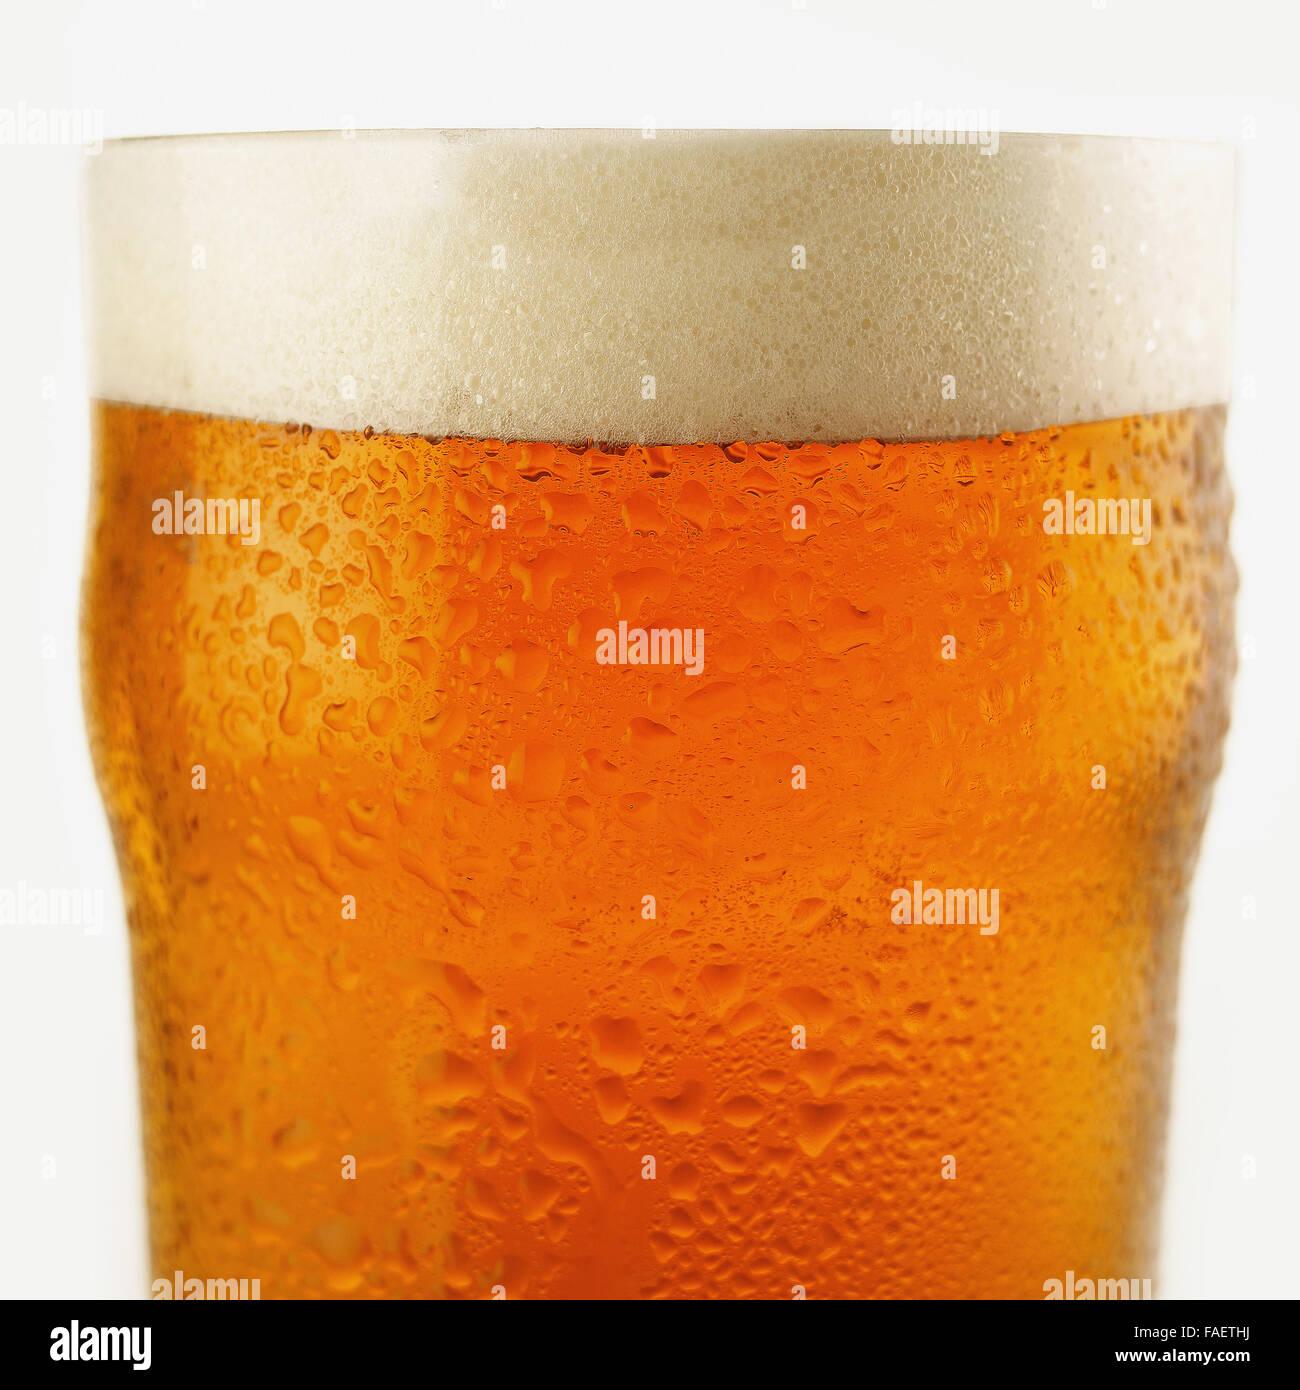 Cerca de una pinta de cerveza recién servida de refrigerada cerveza lager. Imagen De Stock